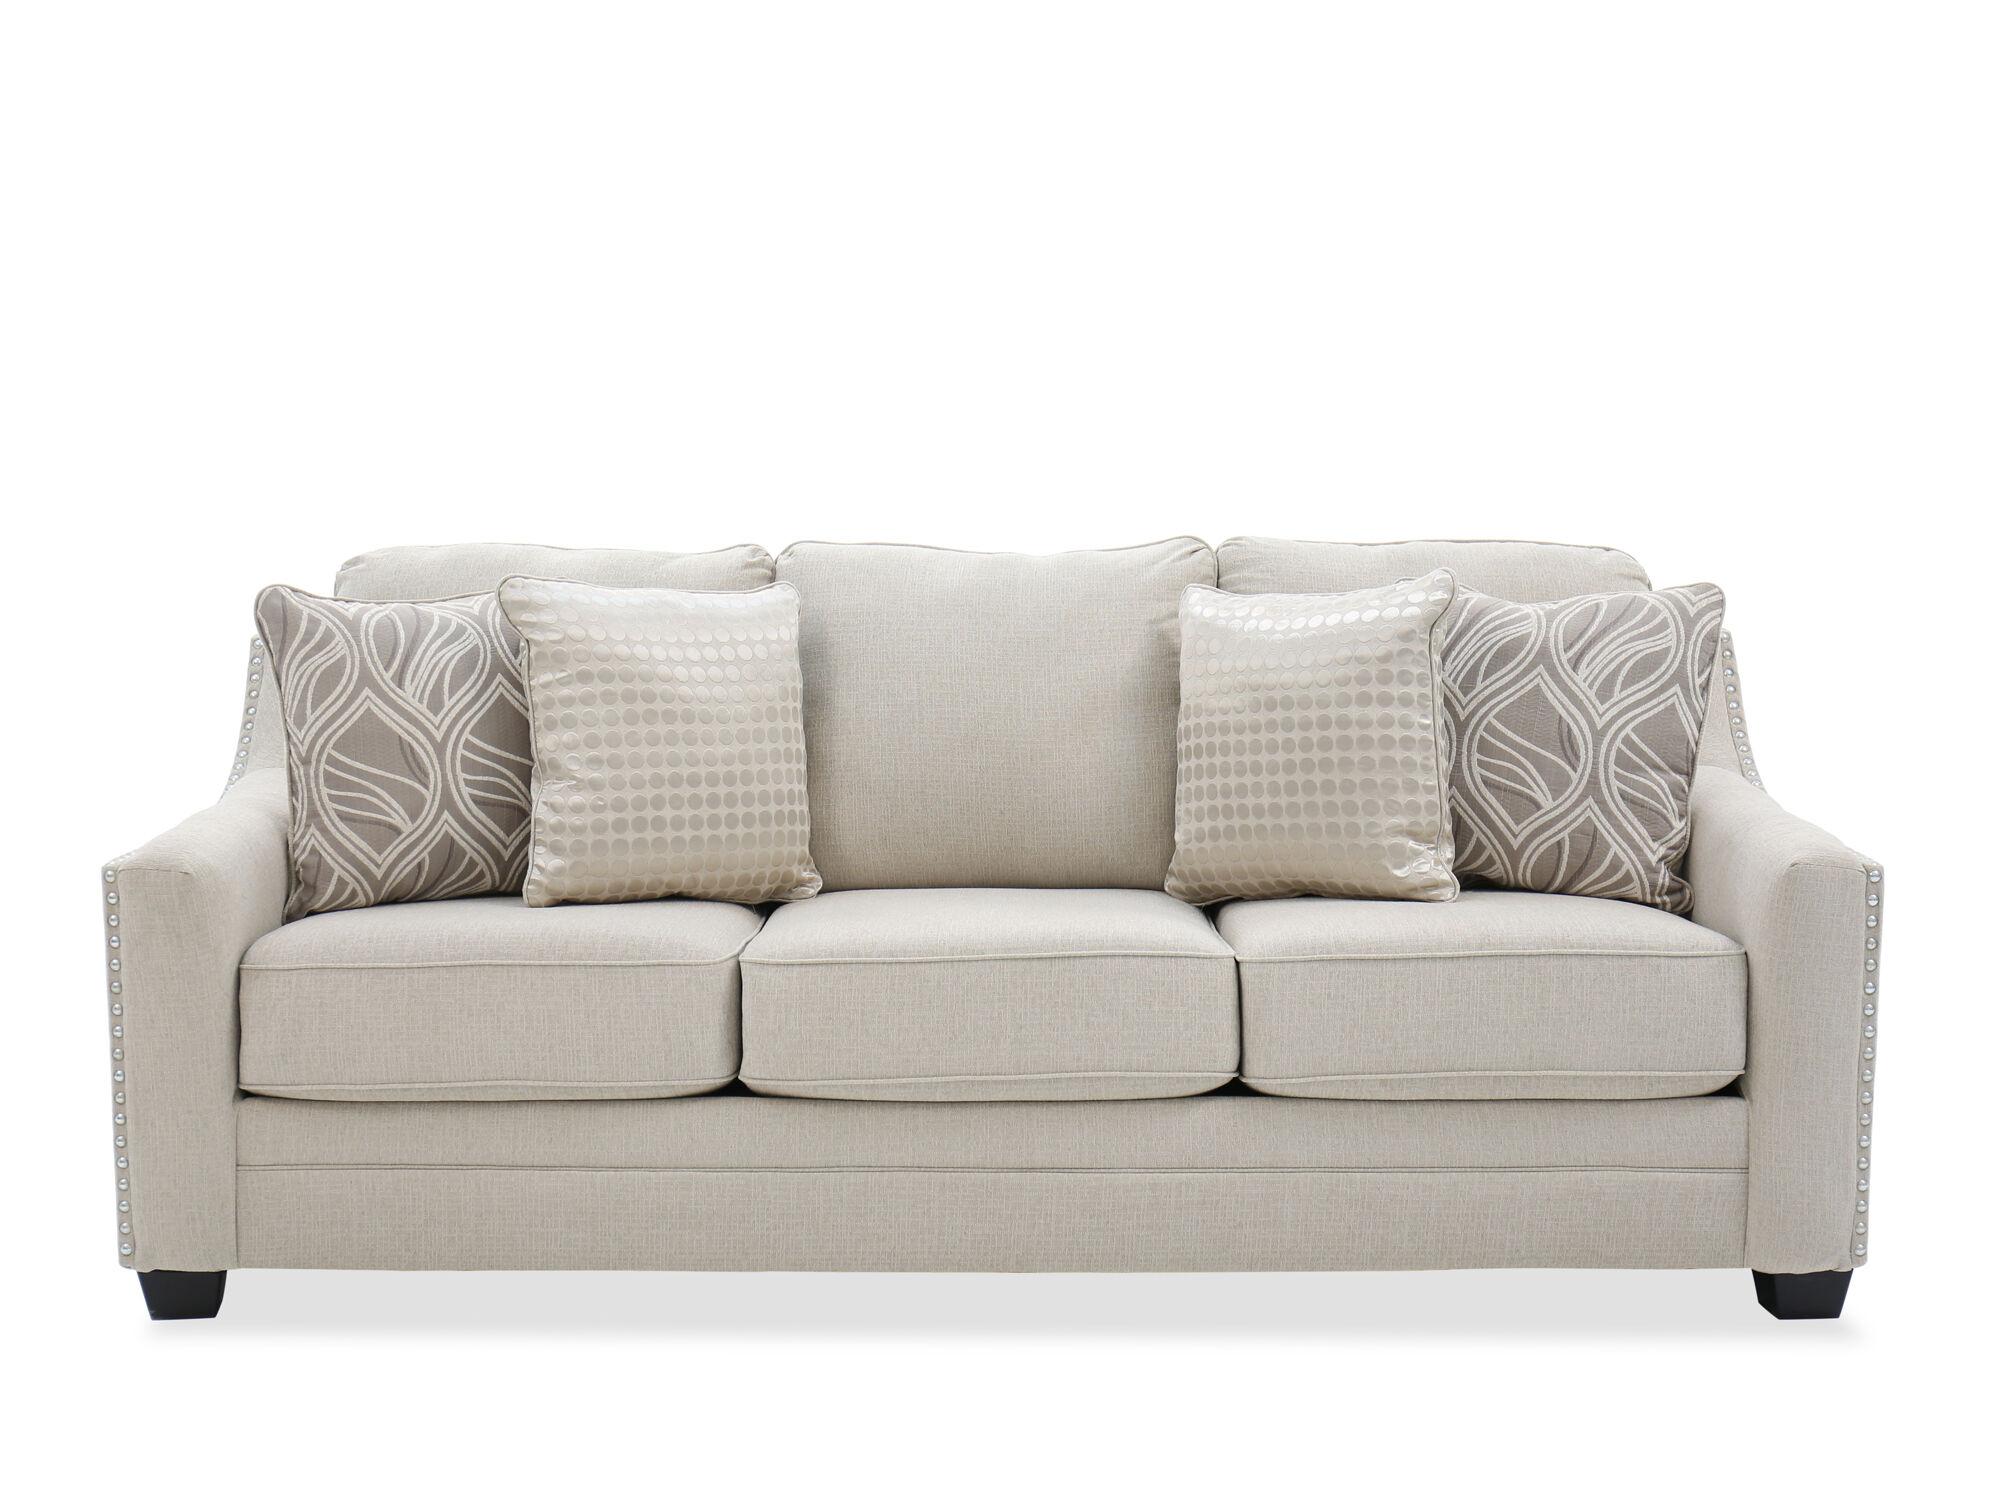 Straight Arm 92u0026quot; Sofa In Linen